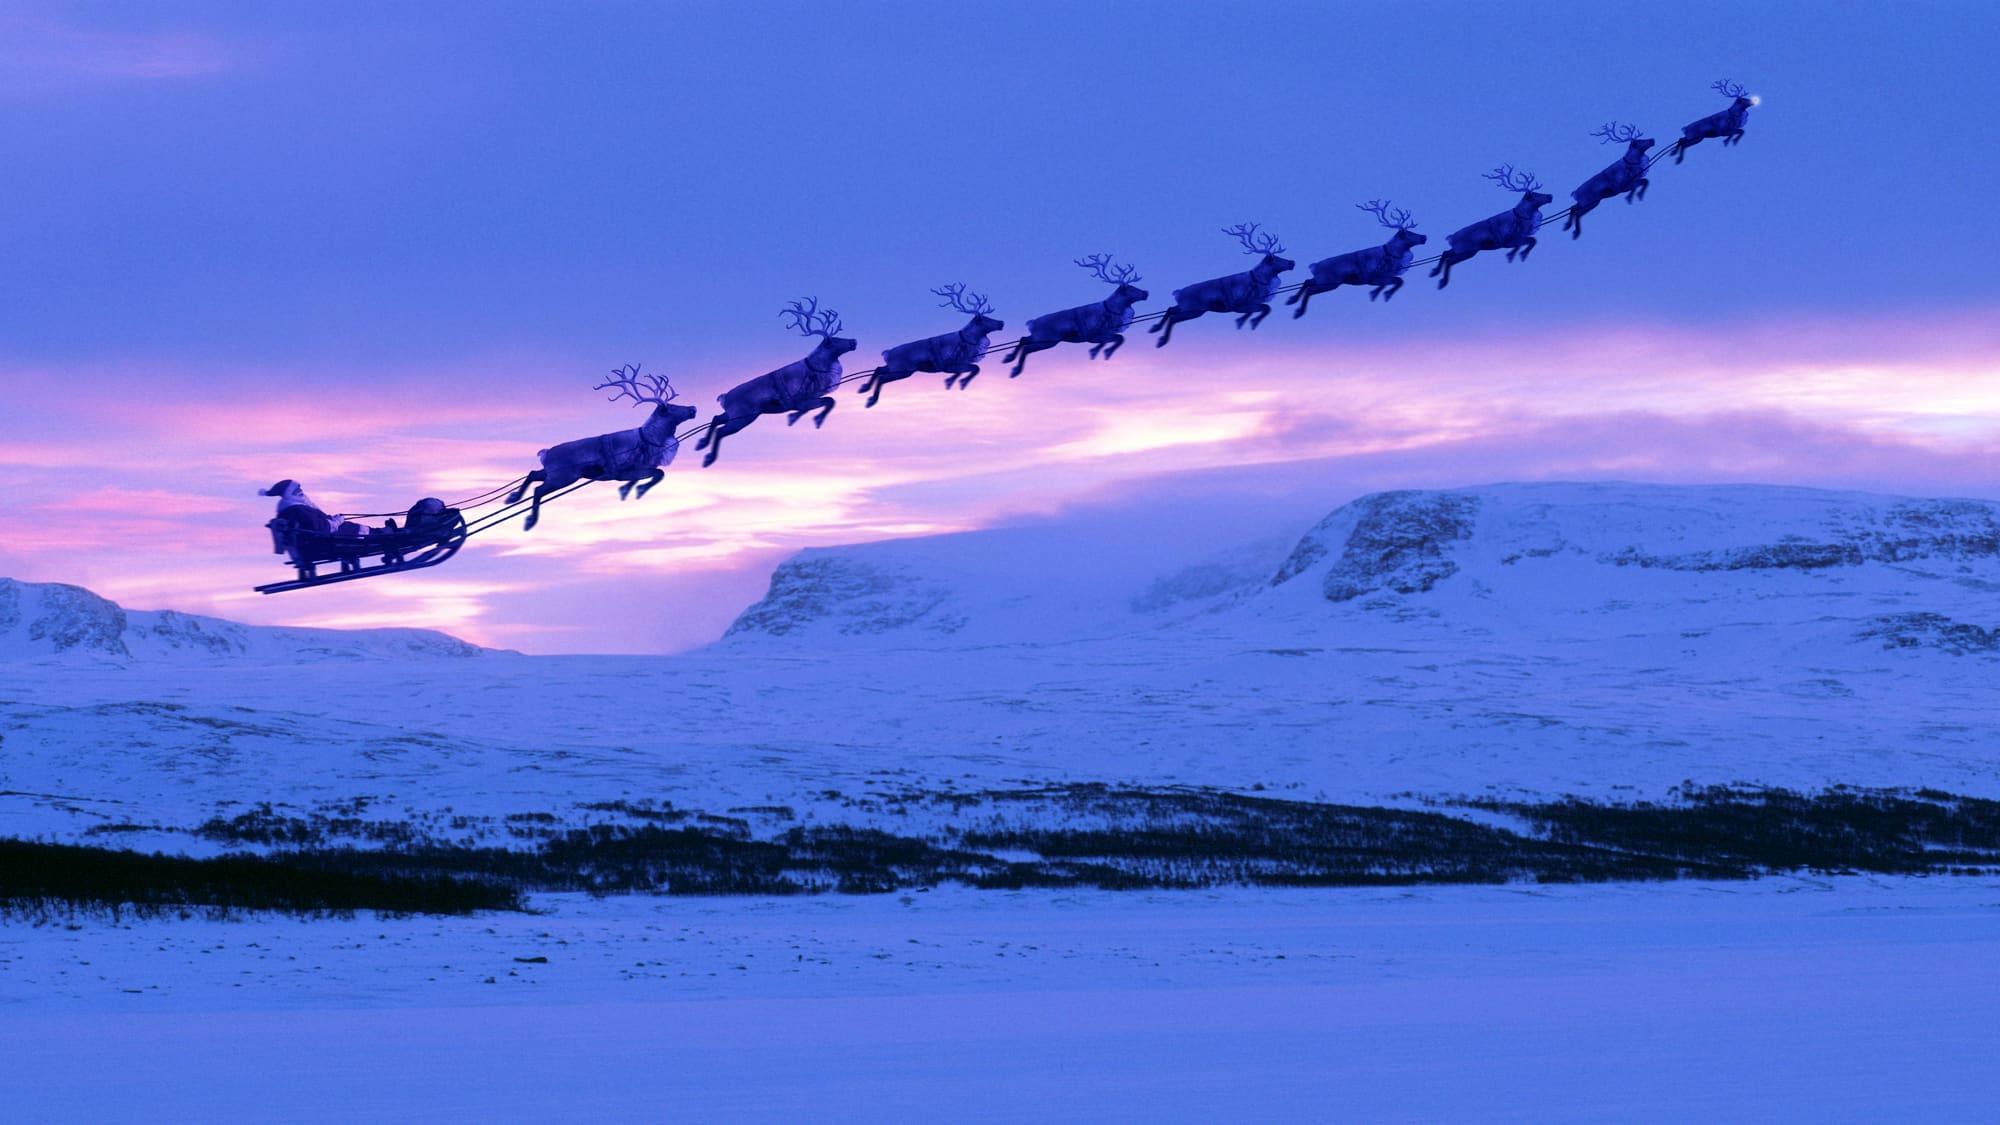 cnbc explains keeping tabs on santa